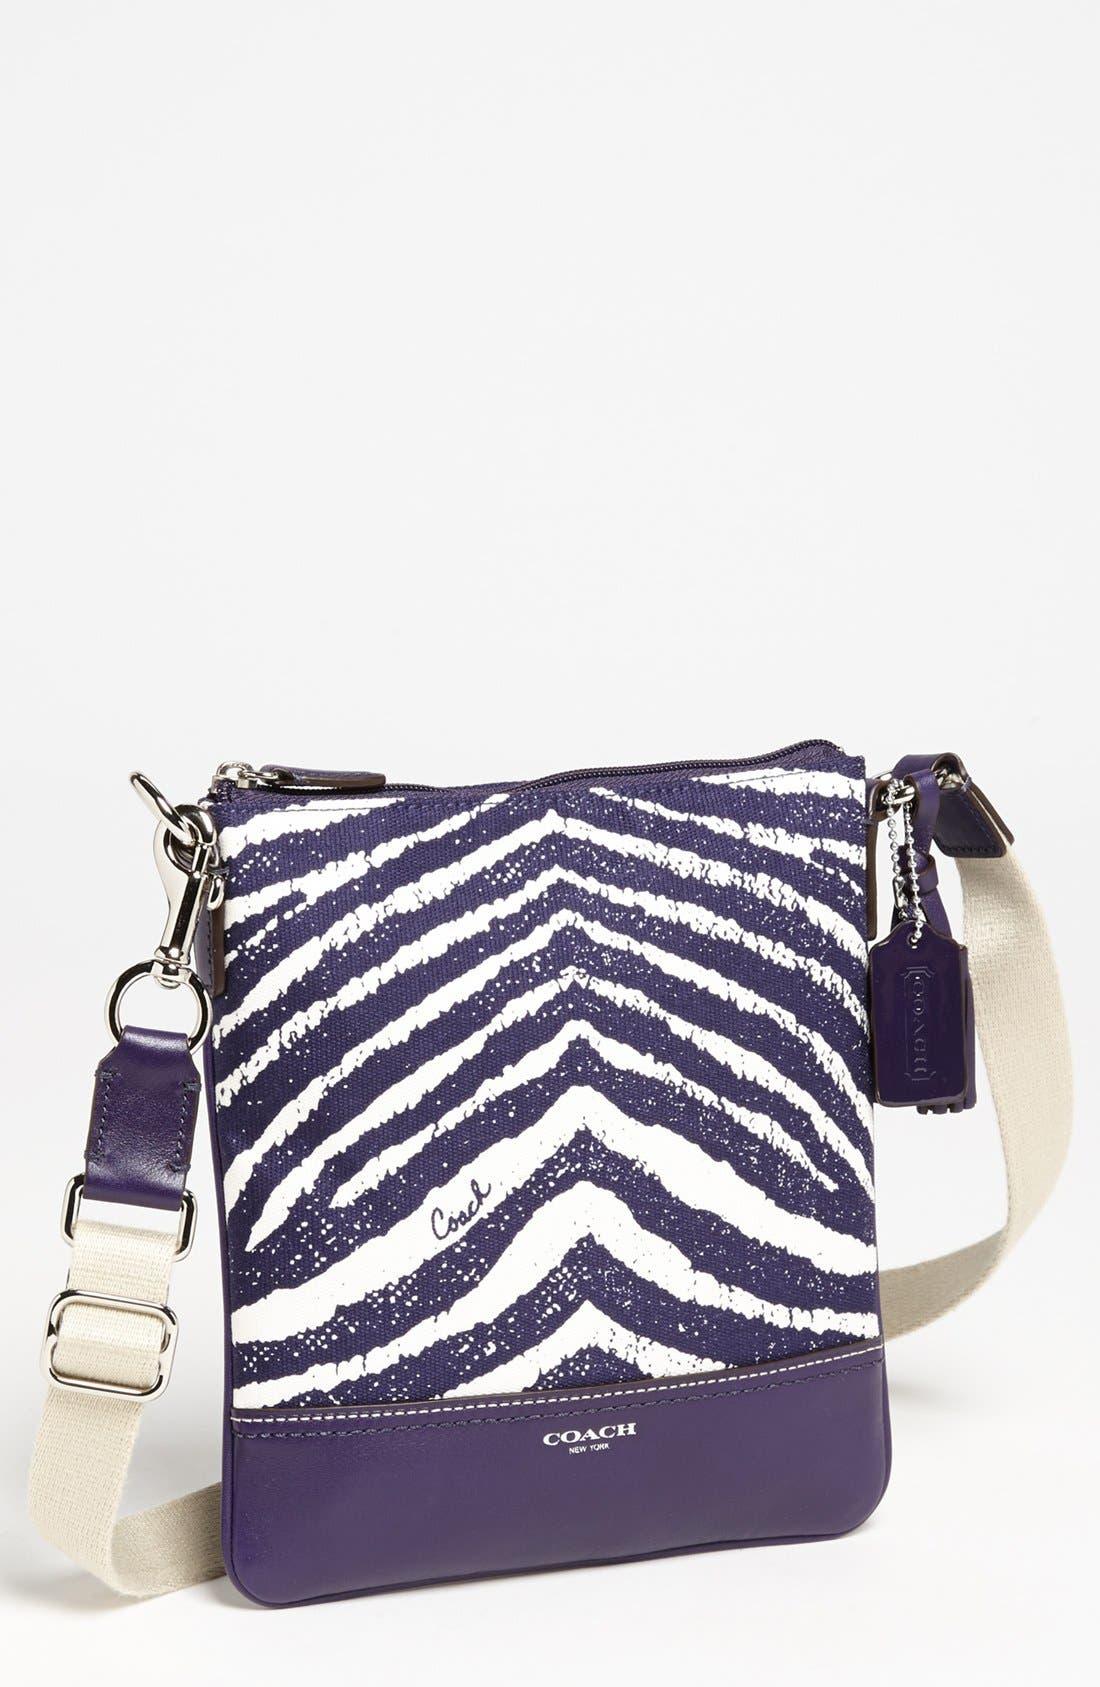 Alternate Image 1 Selected - COACH 'Legacy - Swingpack' Zebra Print Crossbody Bag, Small